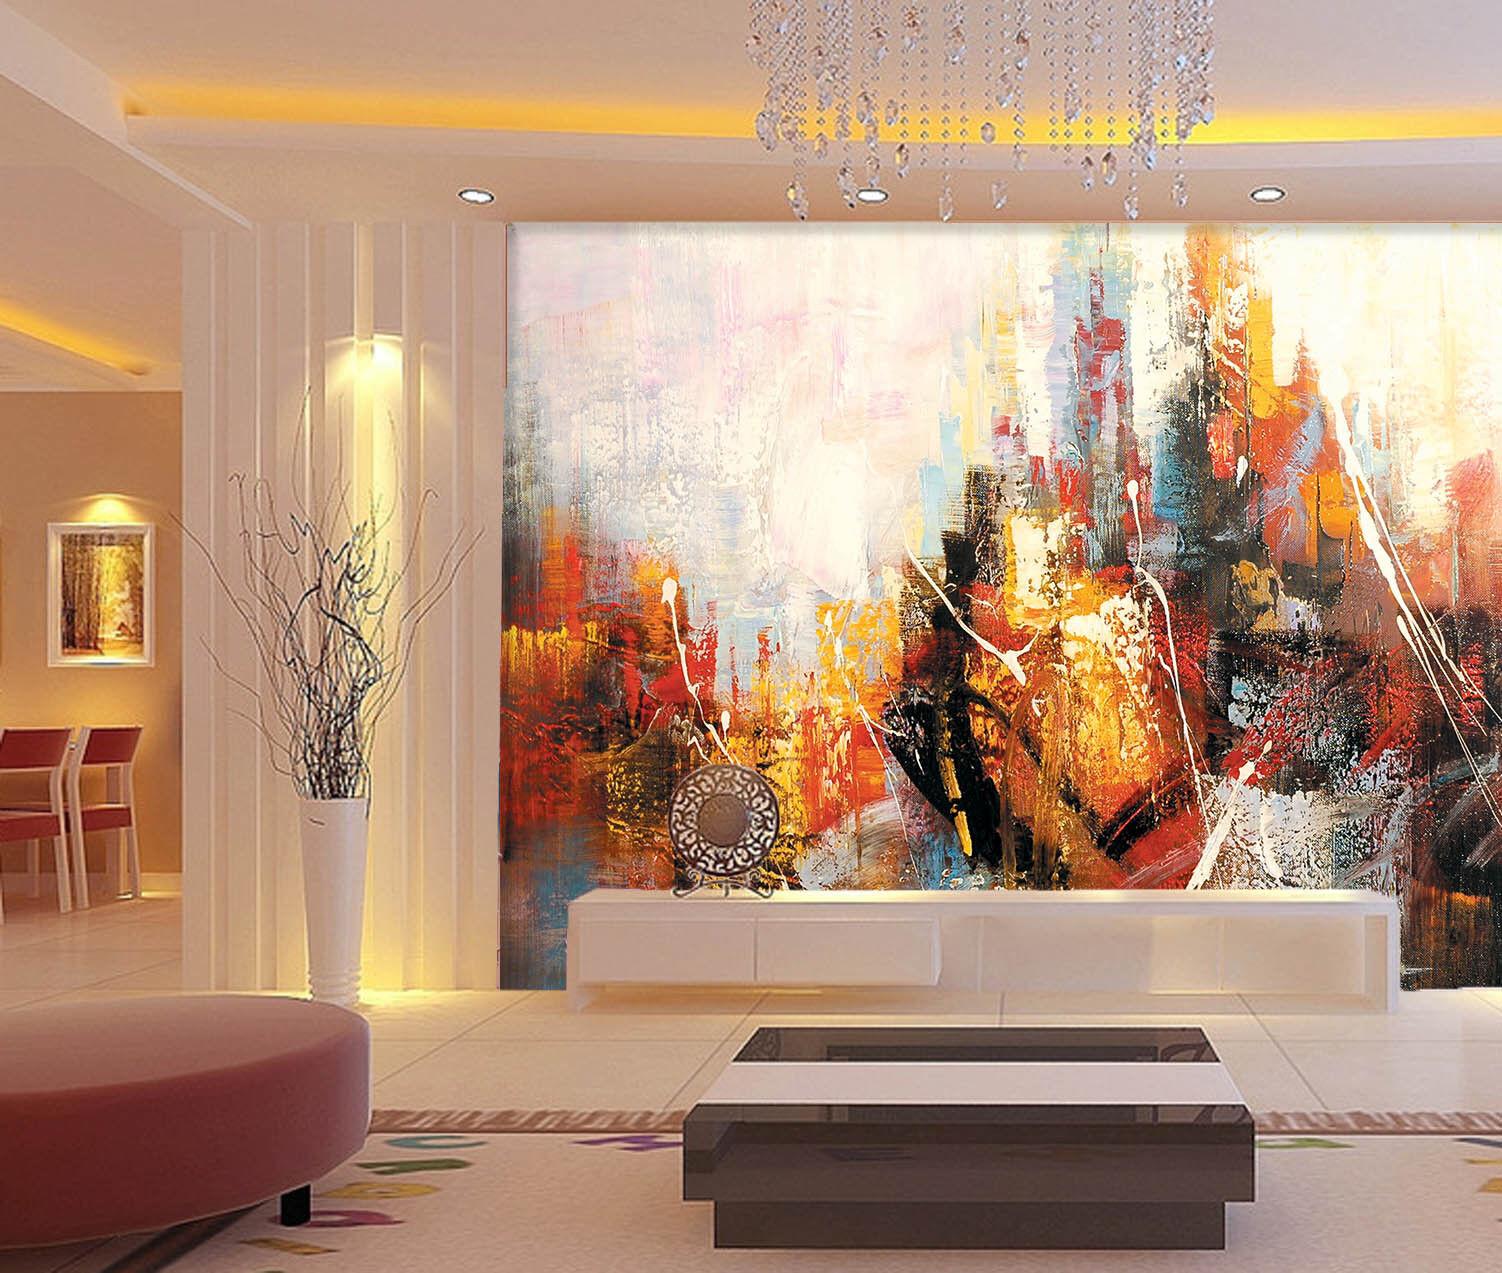 3d Abstract Scribble 908 Wallpaper Mural Wallpaper Wallpaper Picture Family De